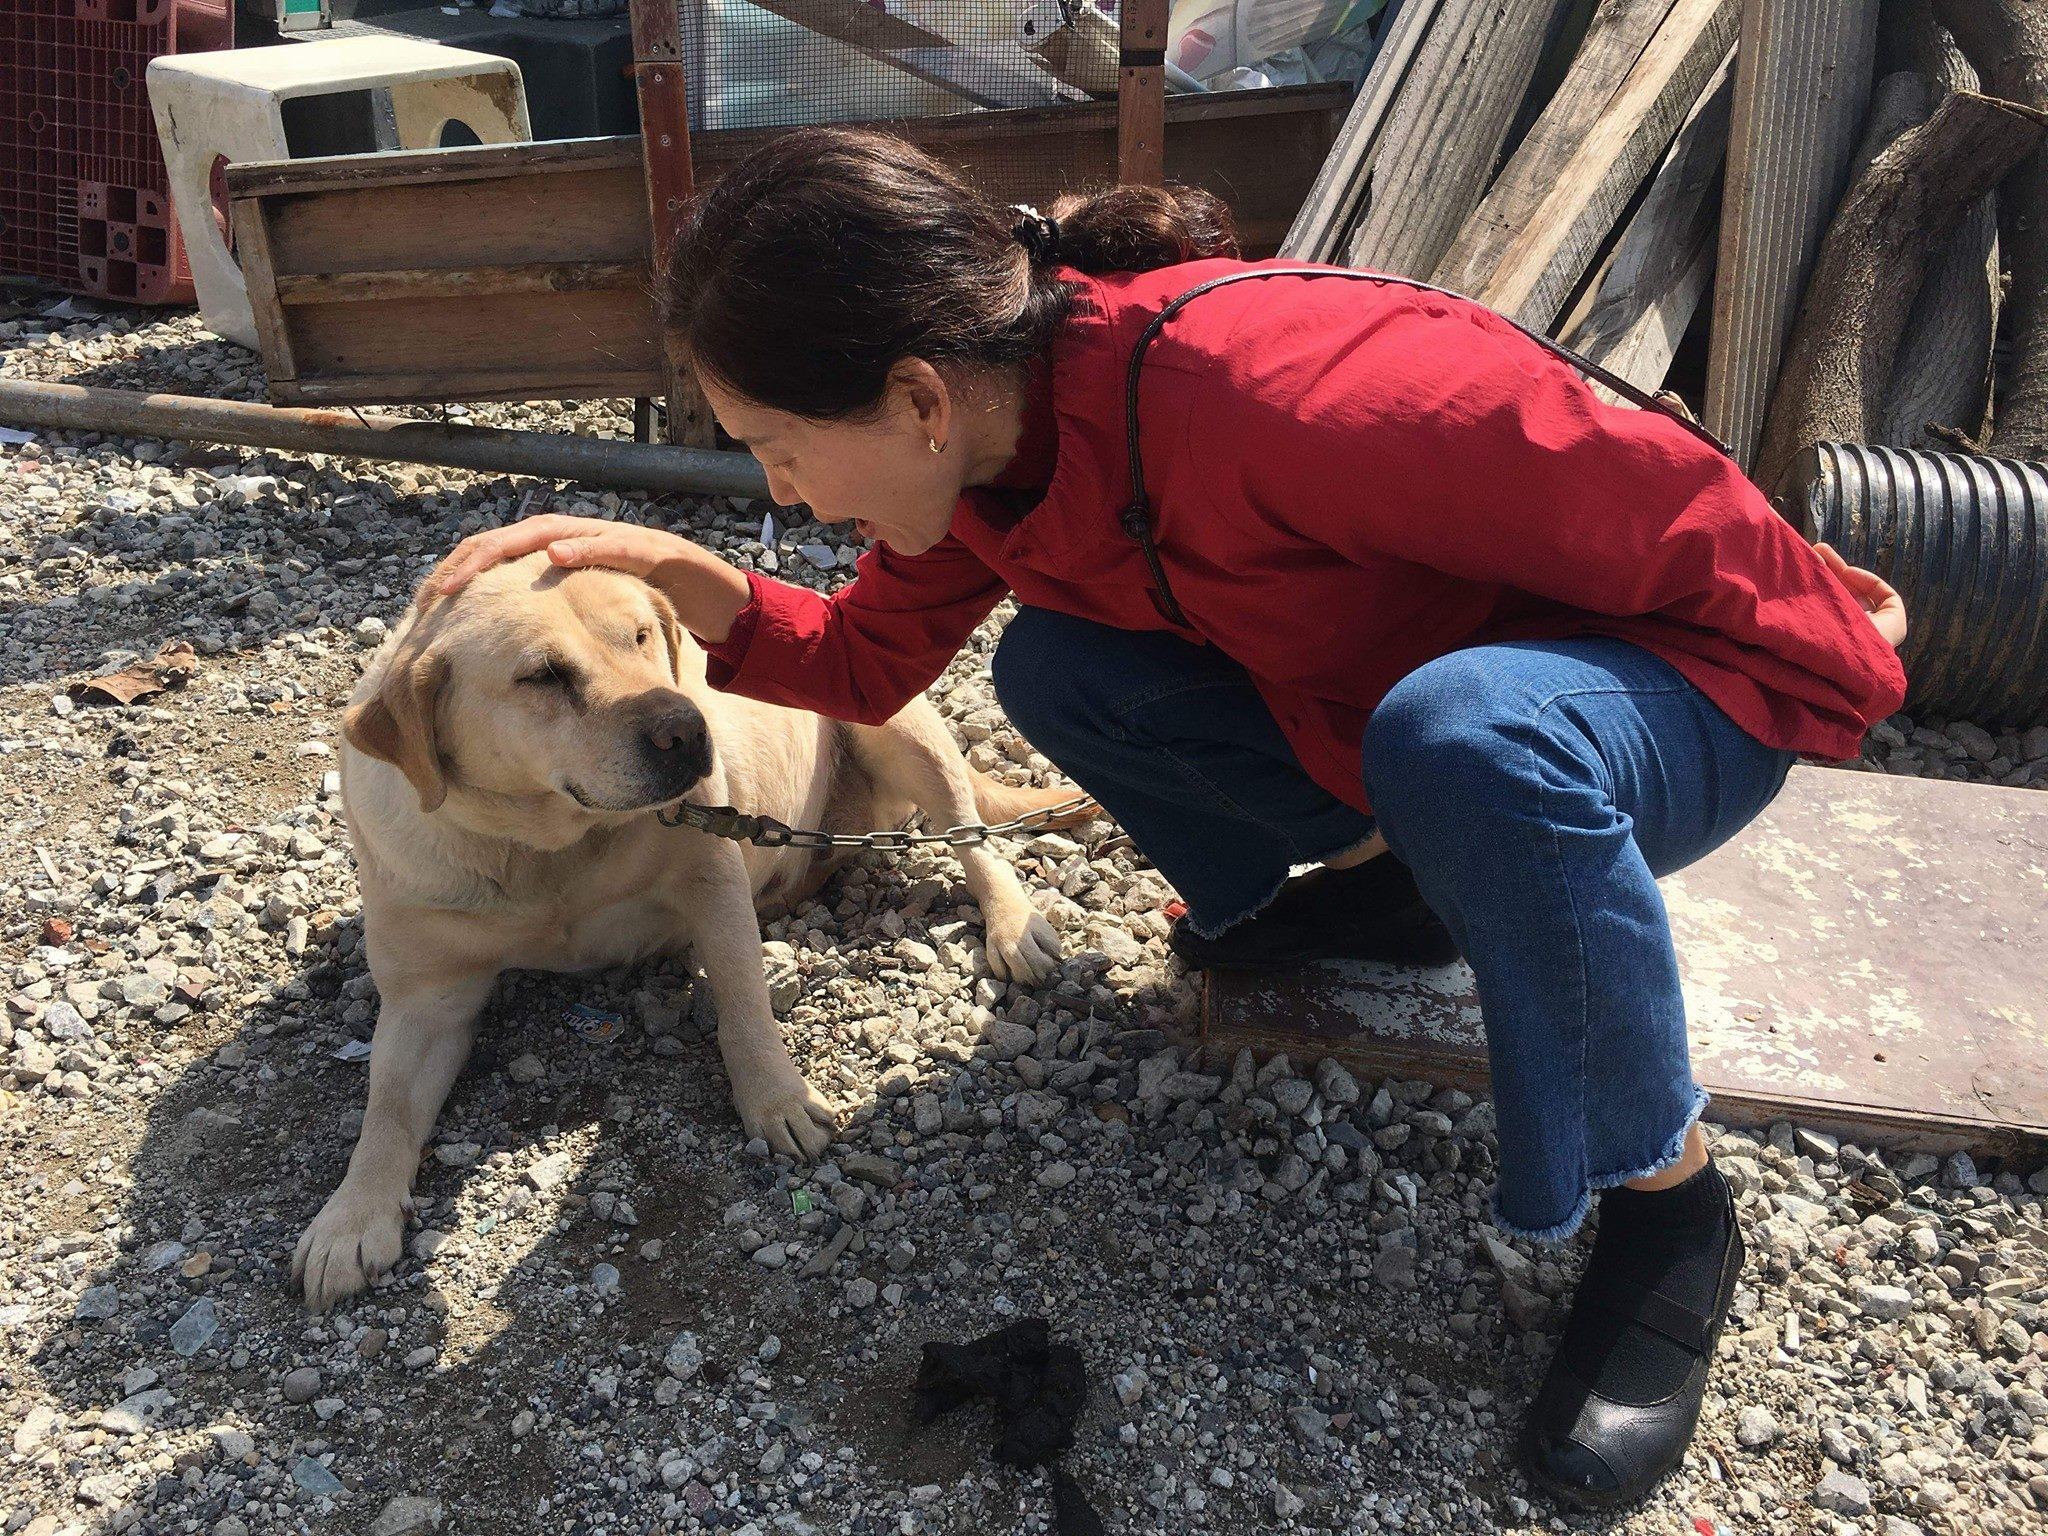 https://www.facebook.com/koreandogs/posts/2109950635689542?utm_source=sendinblue&utm_campaign=Koreas_Constitution_to_Establish_National_Policy_on_Animal_Protection__Sanary__Hongcheongun_Sister_City&utm_medium=email